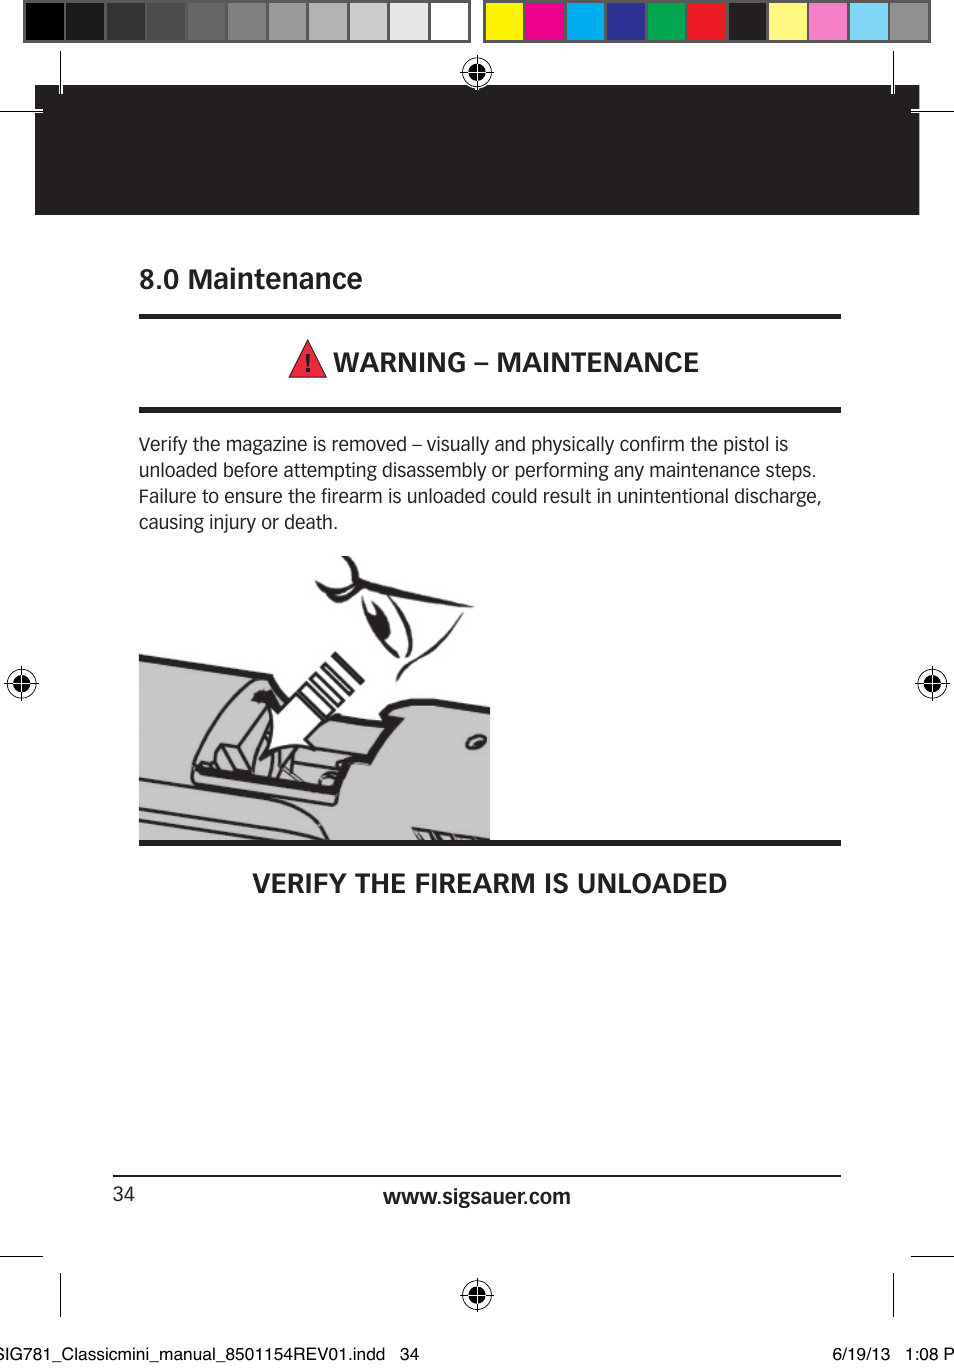 0 maintenance warning maintenance, verify the firearm is unloaded sig p227 enhanced elite 0 maintenance warning maintenance, verify the firearm is unloaded sig sauer p229 user